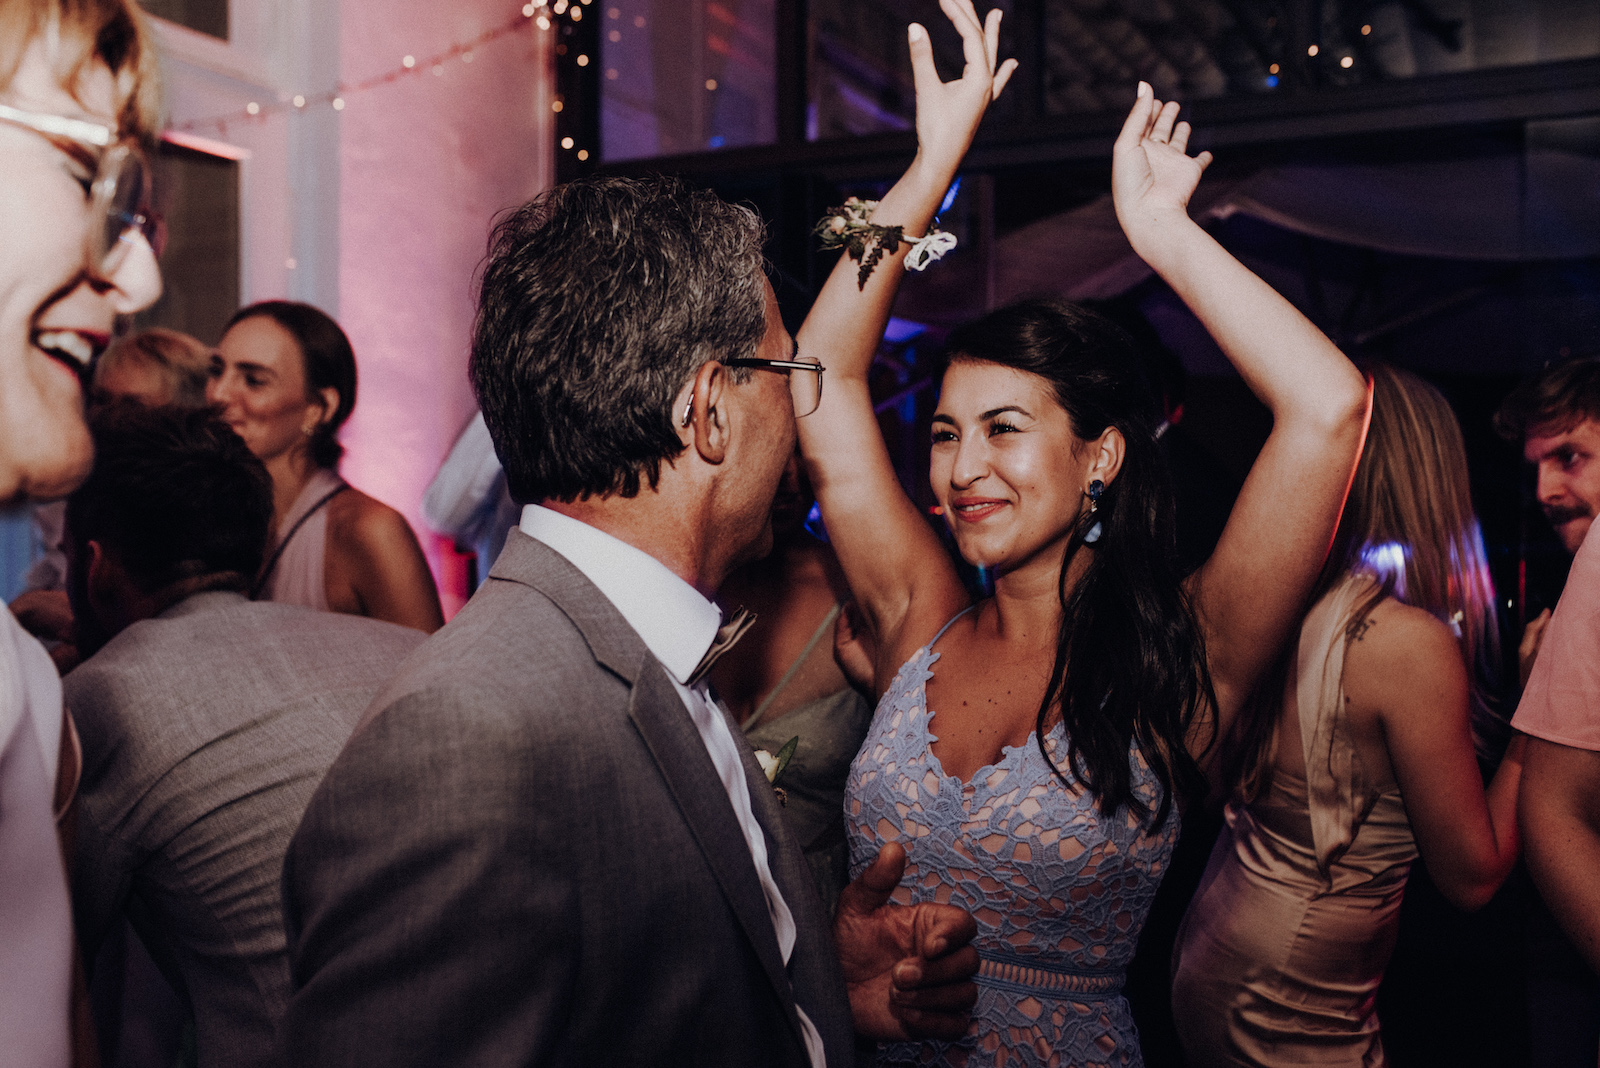 Hochzeitsfeier-Gut-Bliestorf